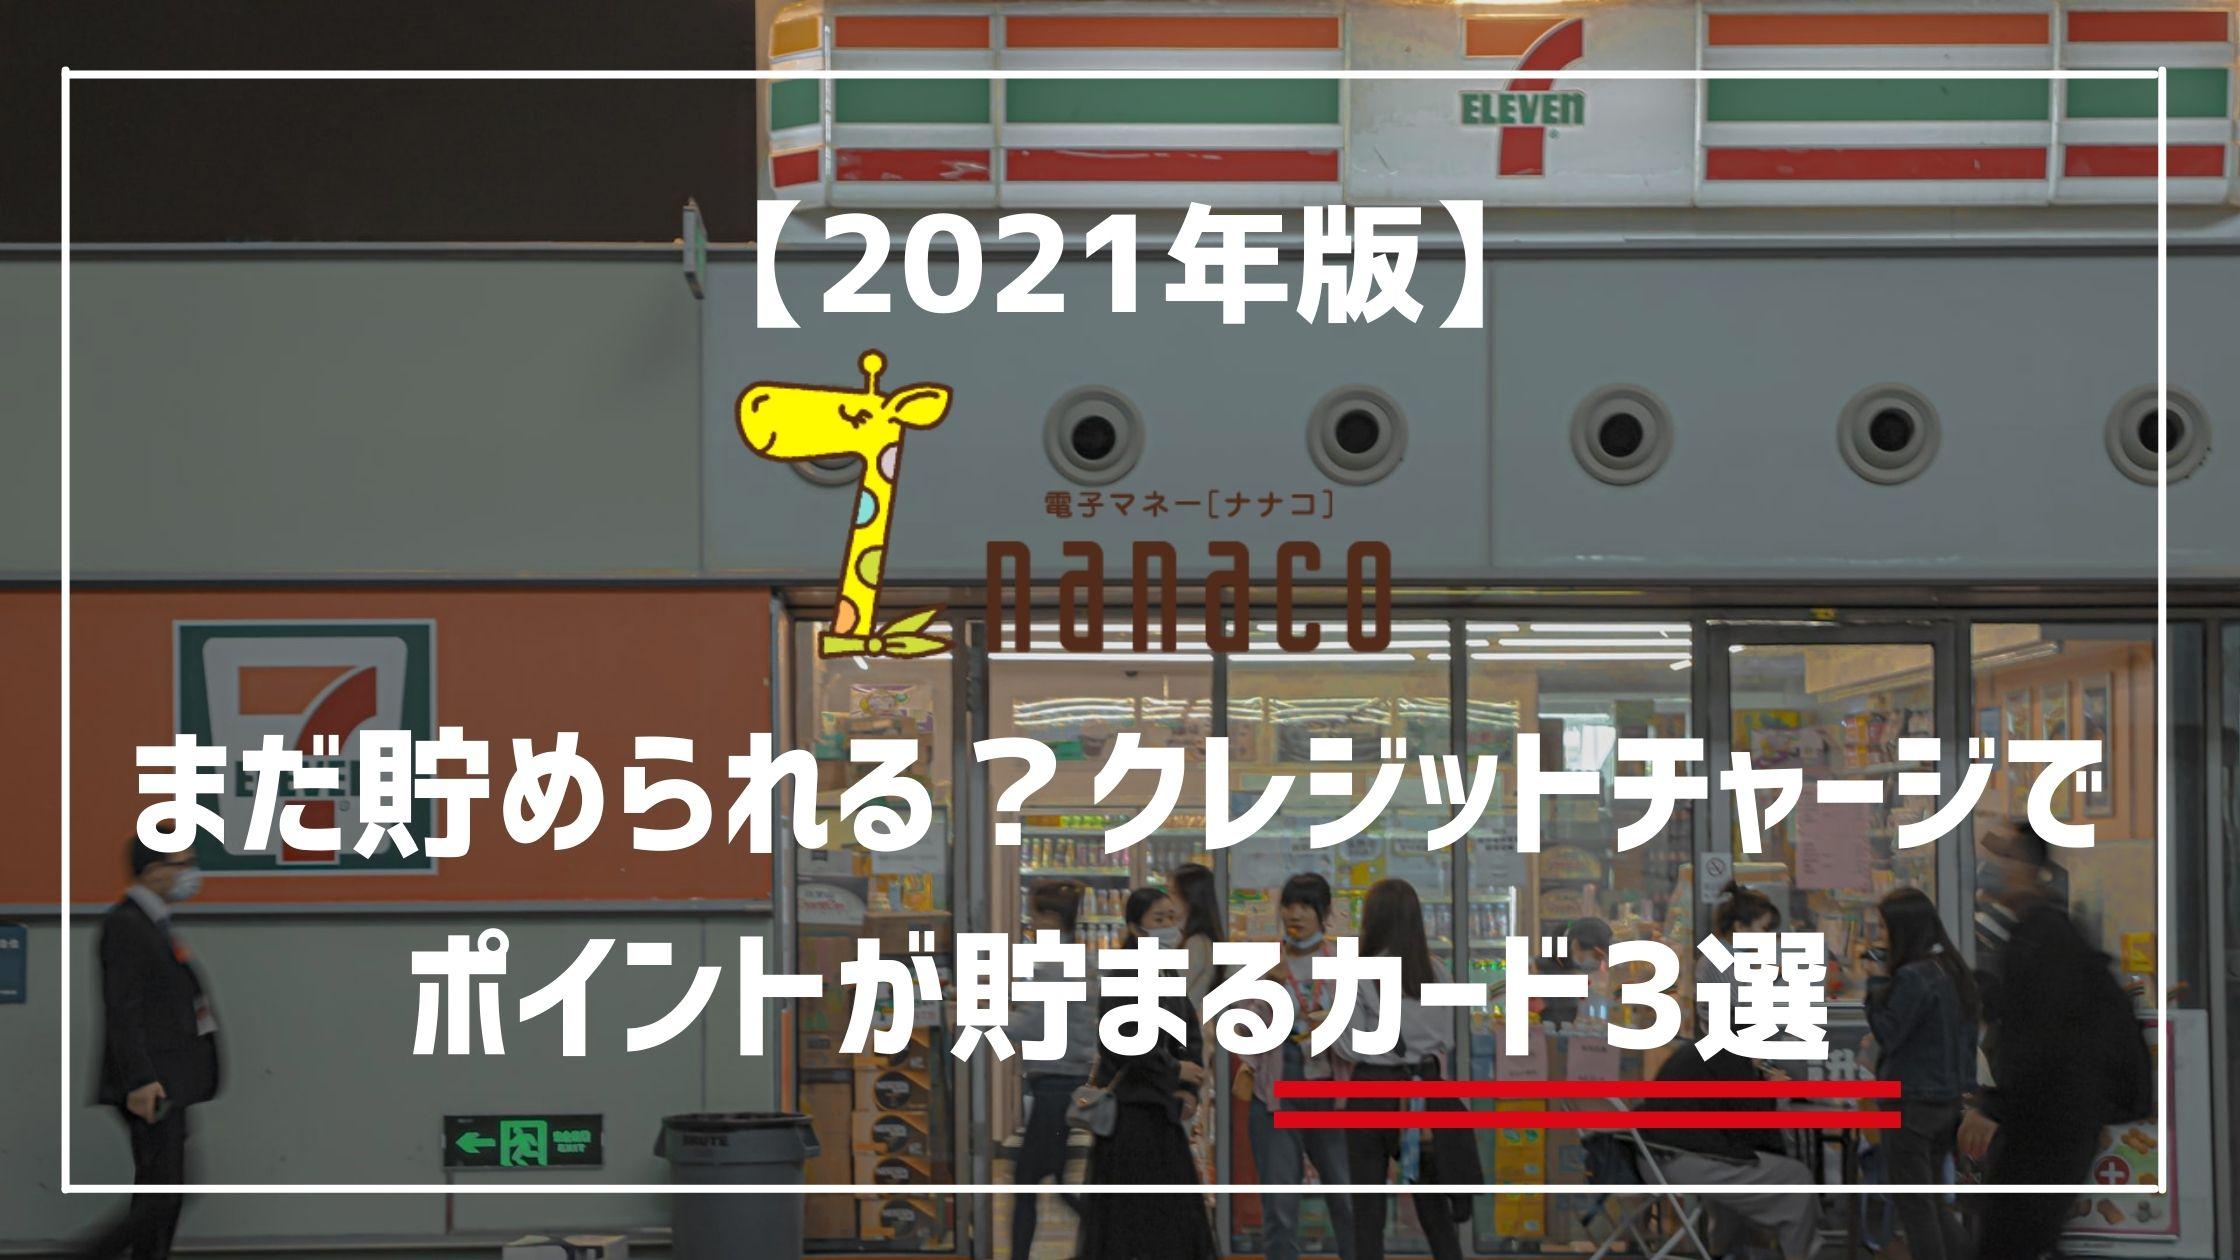 nanaco,5万円,ポイント還元,クレジットカード